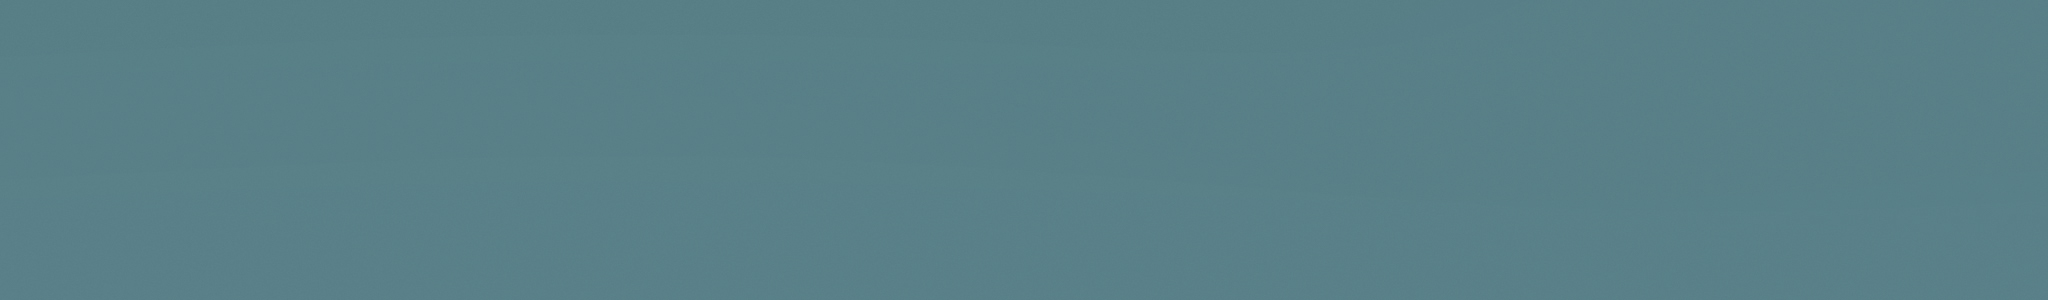 HU 16244 ABS hrana zelená hladká 100 lesk 10°